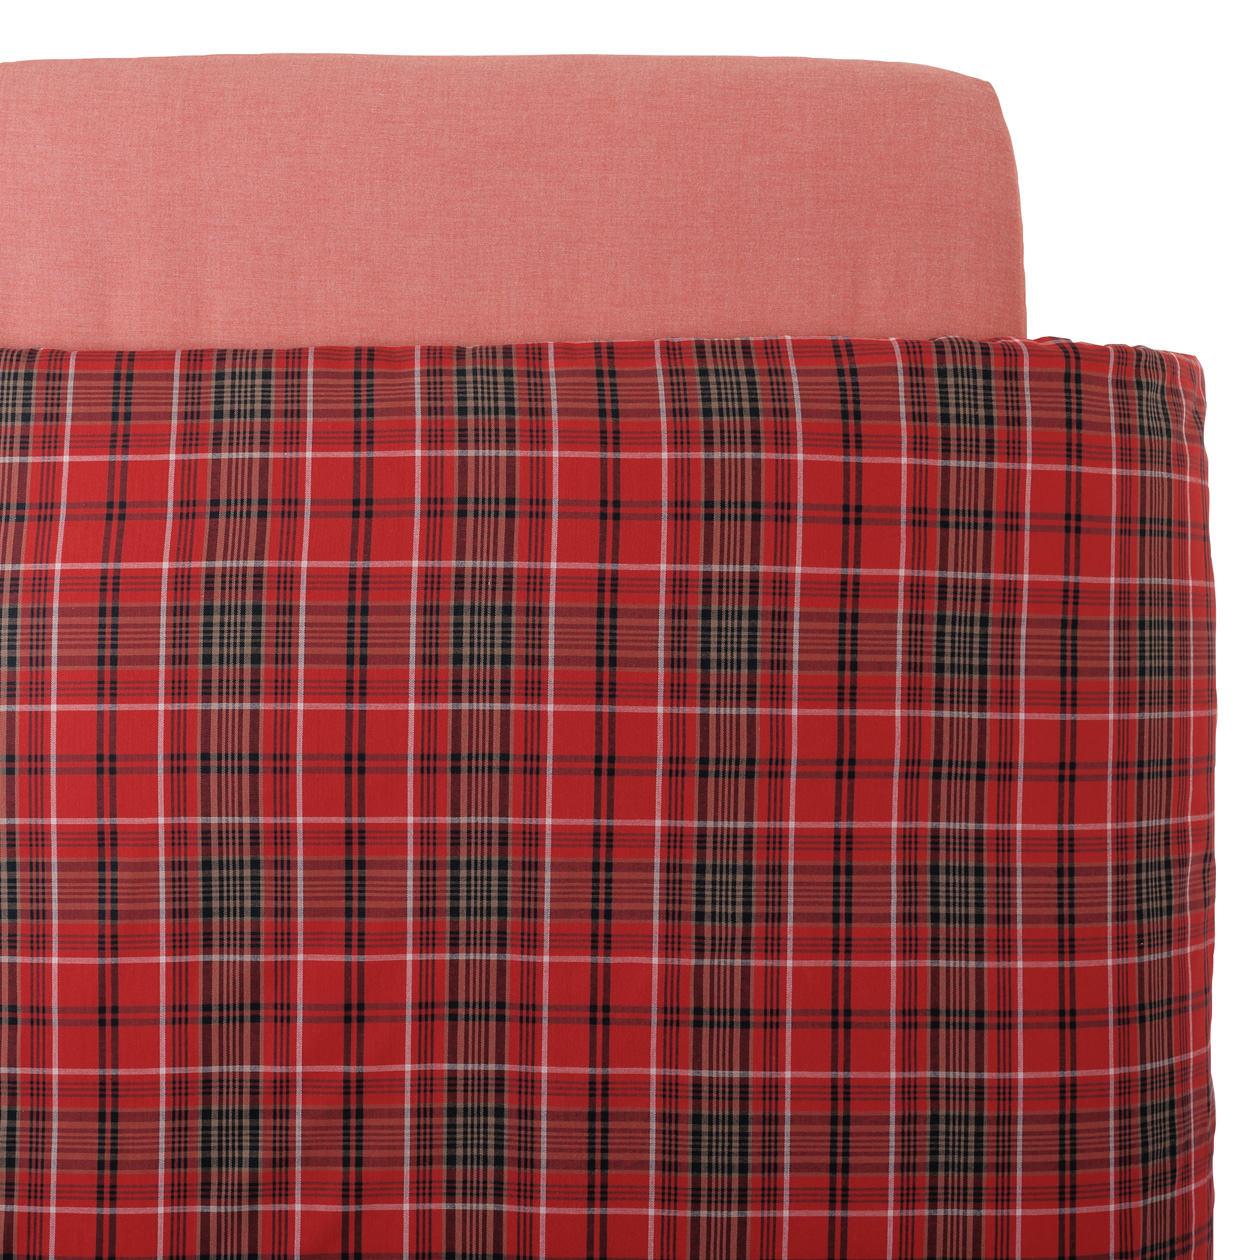 MUJI хлопок фланель одеяло